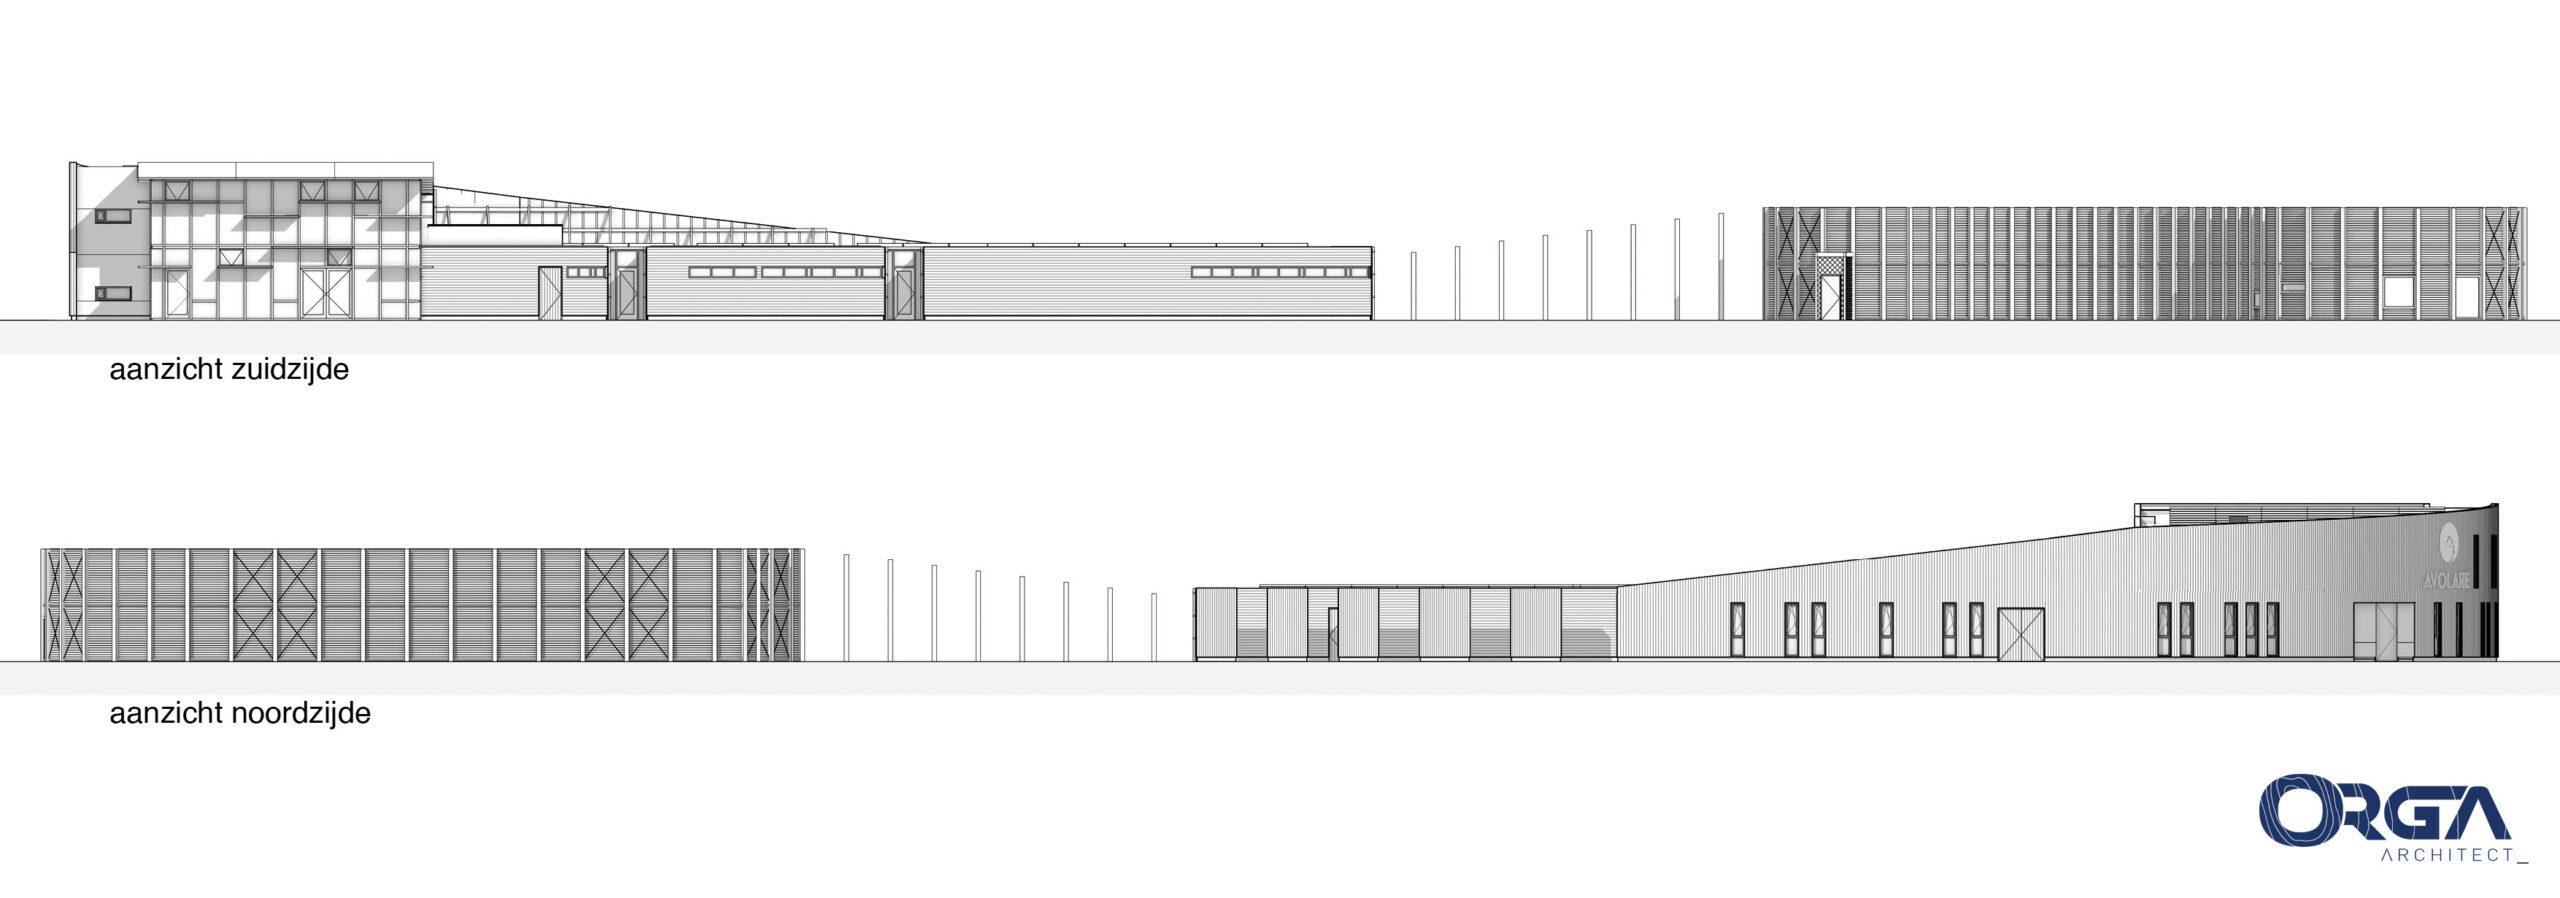 Orga Architect Bouw Avolare 011 Aanzicht